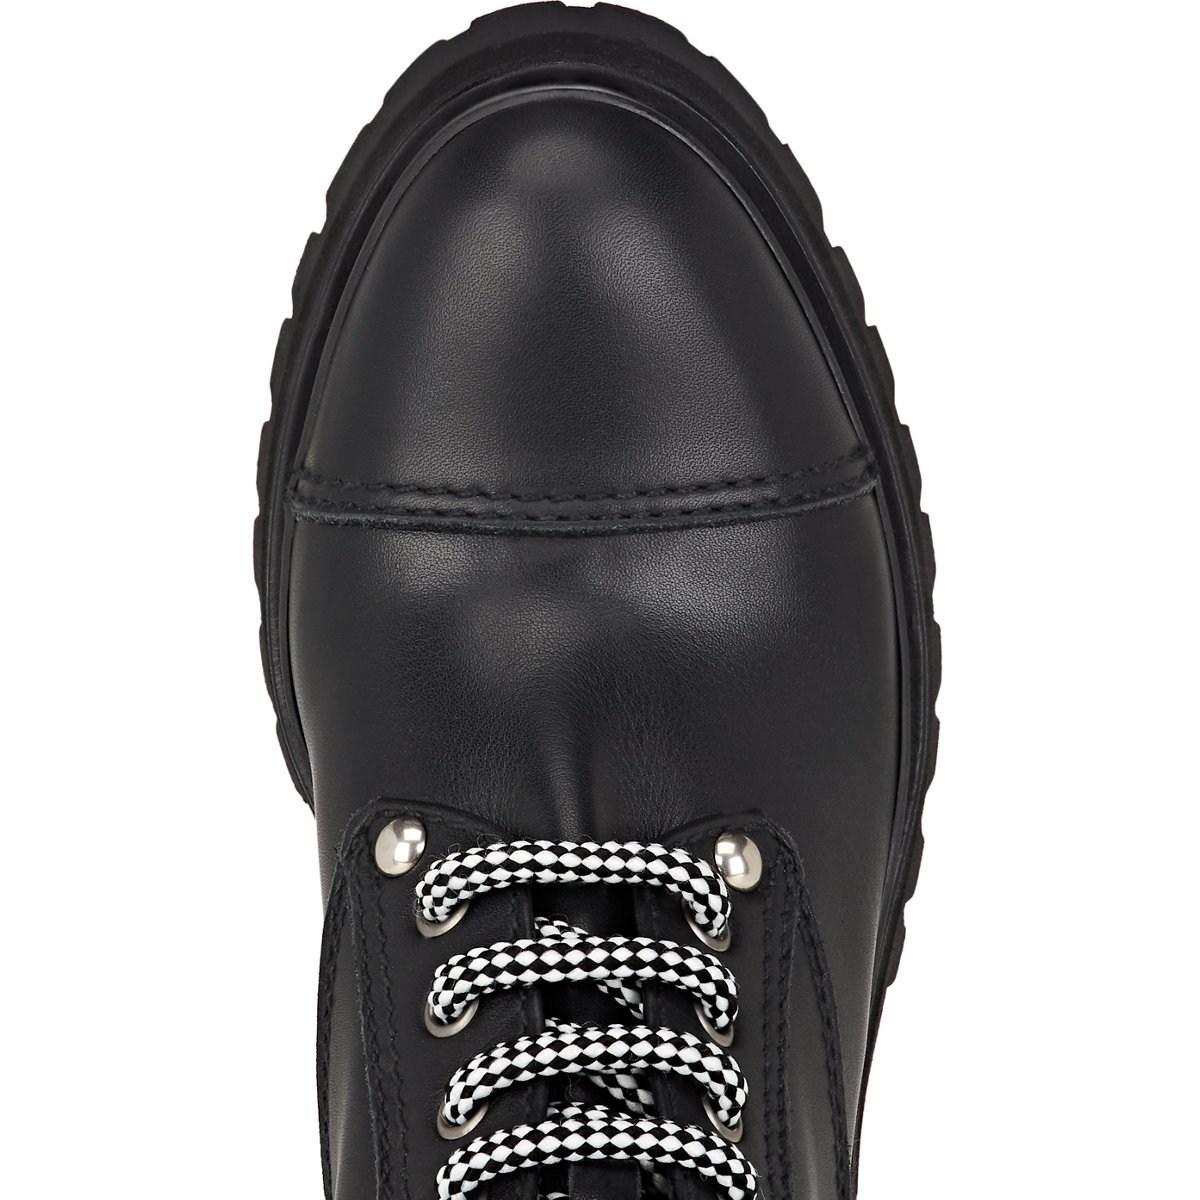 9260b2a04b168 Miu Miu - Black Lug-sole Leather Ankle Boots - Lyst. View fullscreen